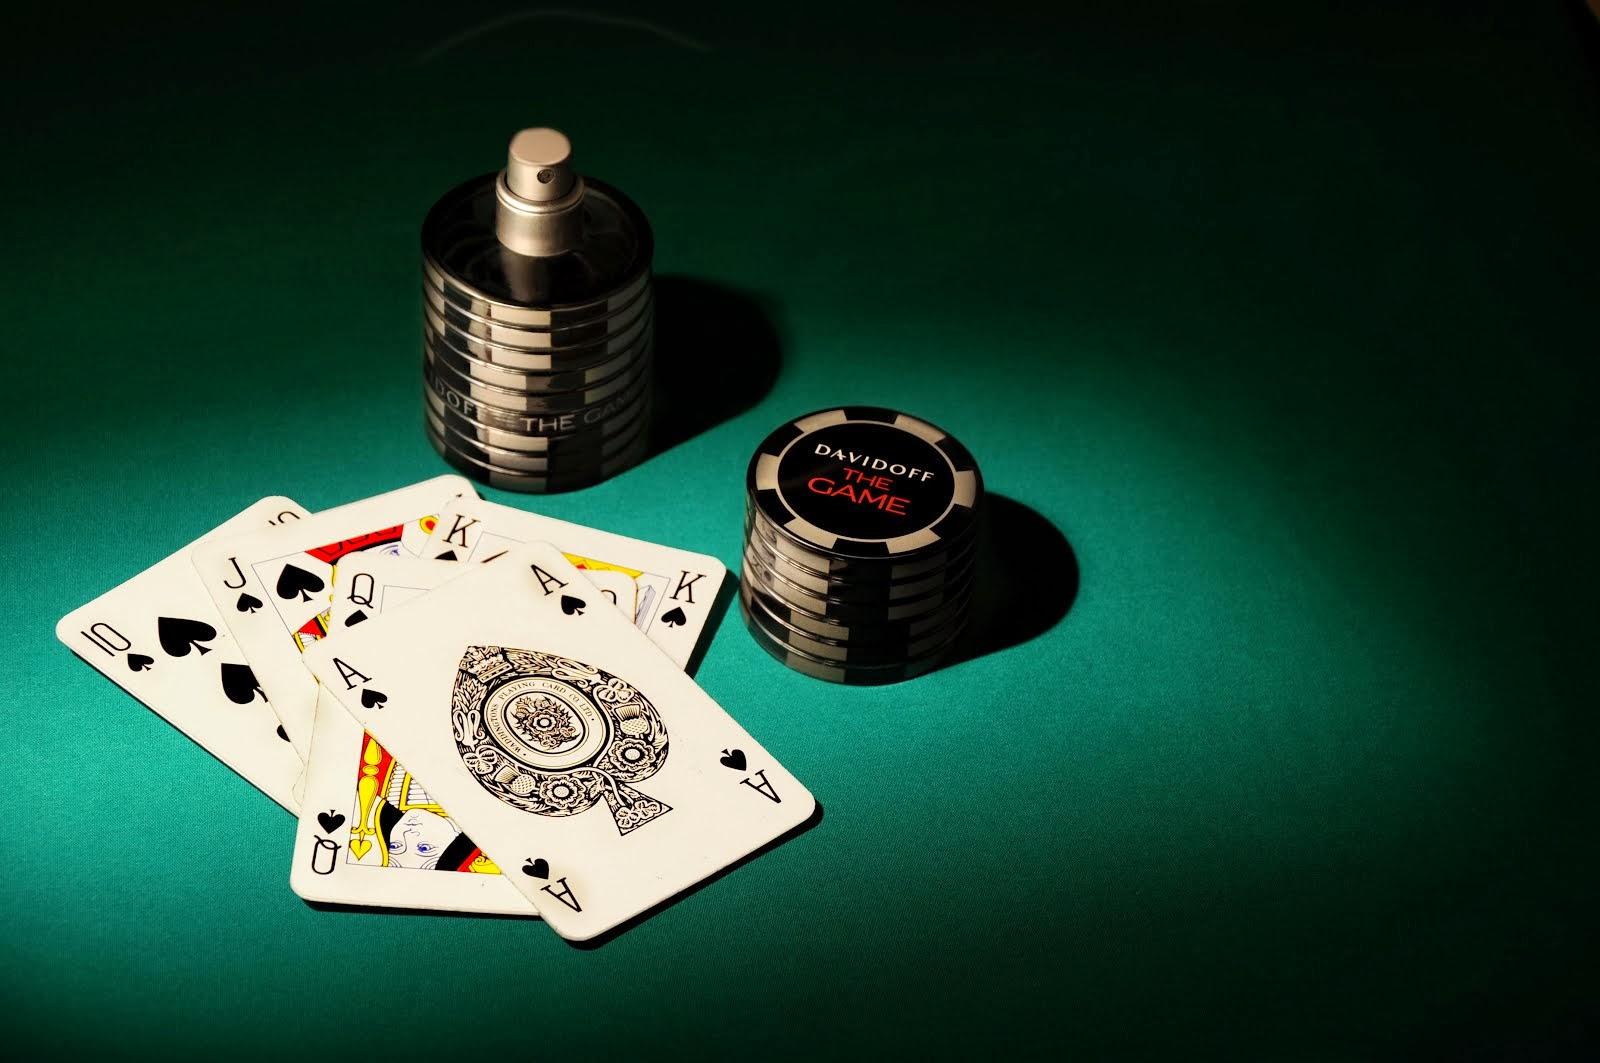 Davidoff - THE GAME